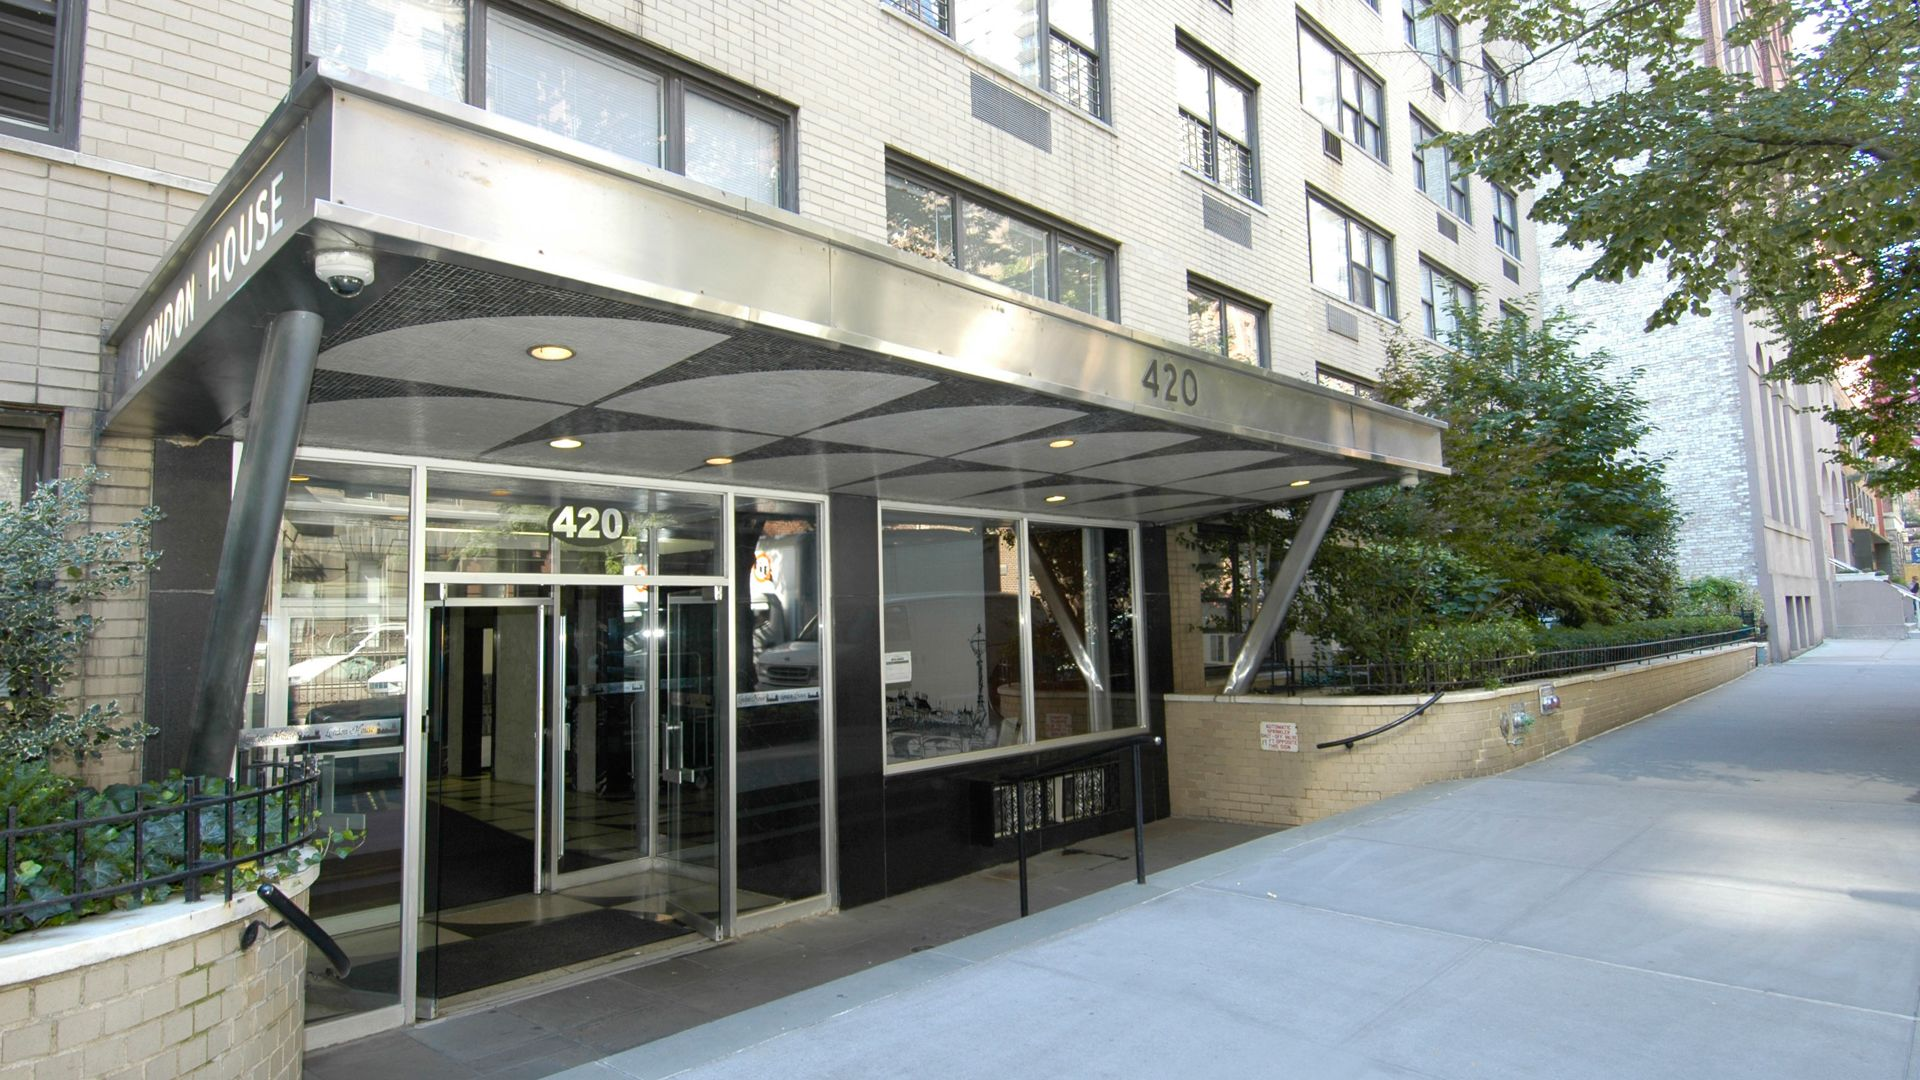 420 East 80th Street Apartments - Entrane